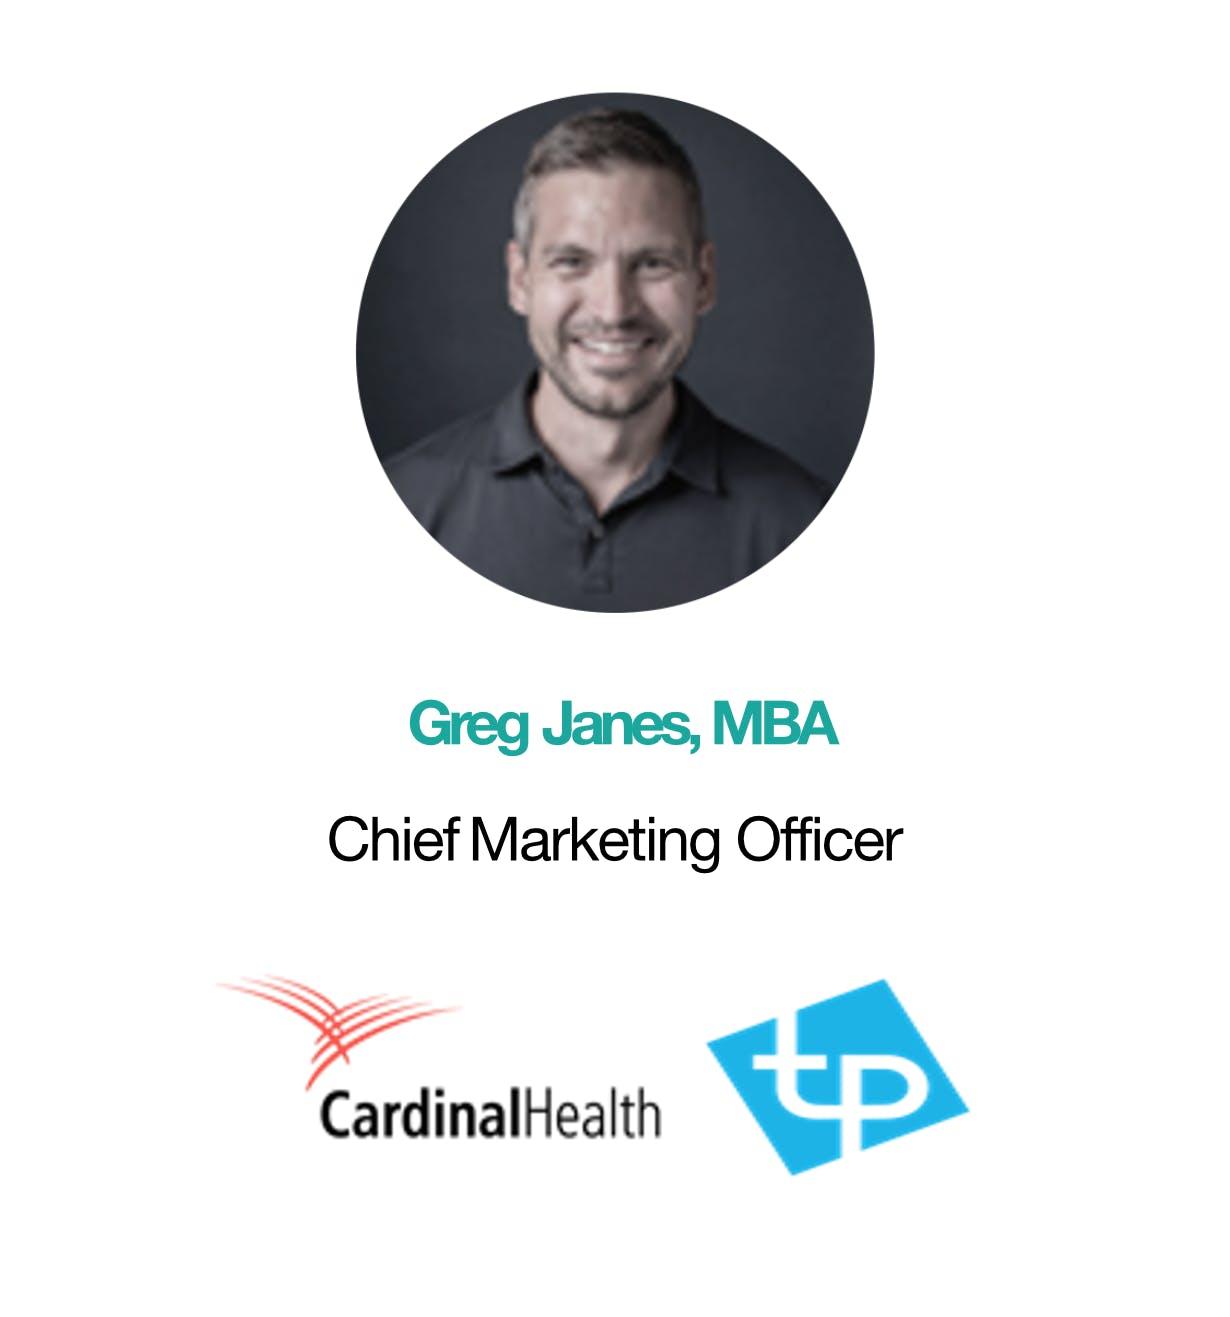 Greg Janes, MBA Chief Marketing Officer Cardinal Health